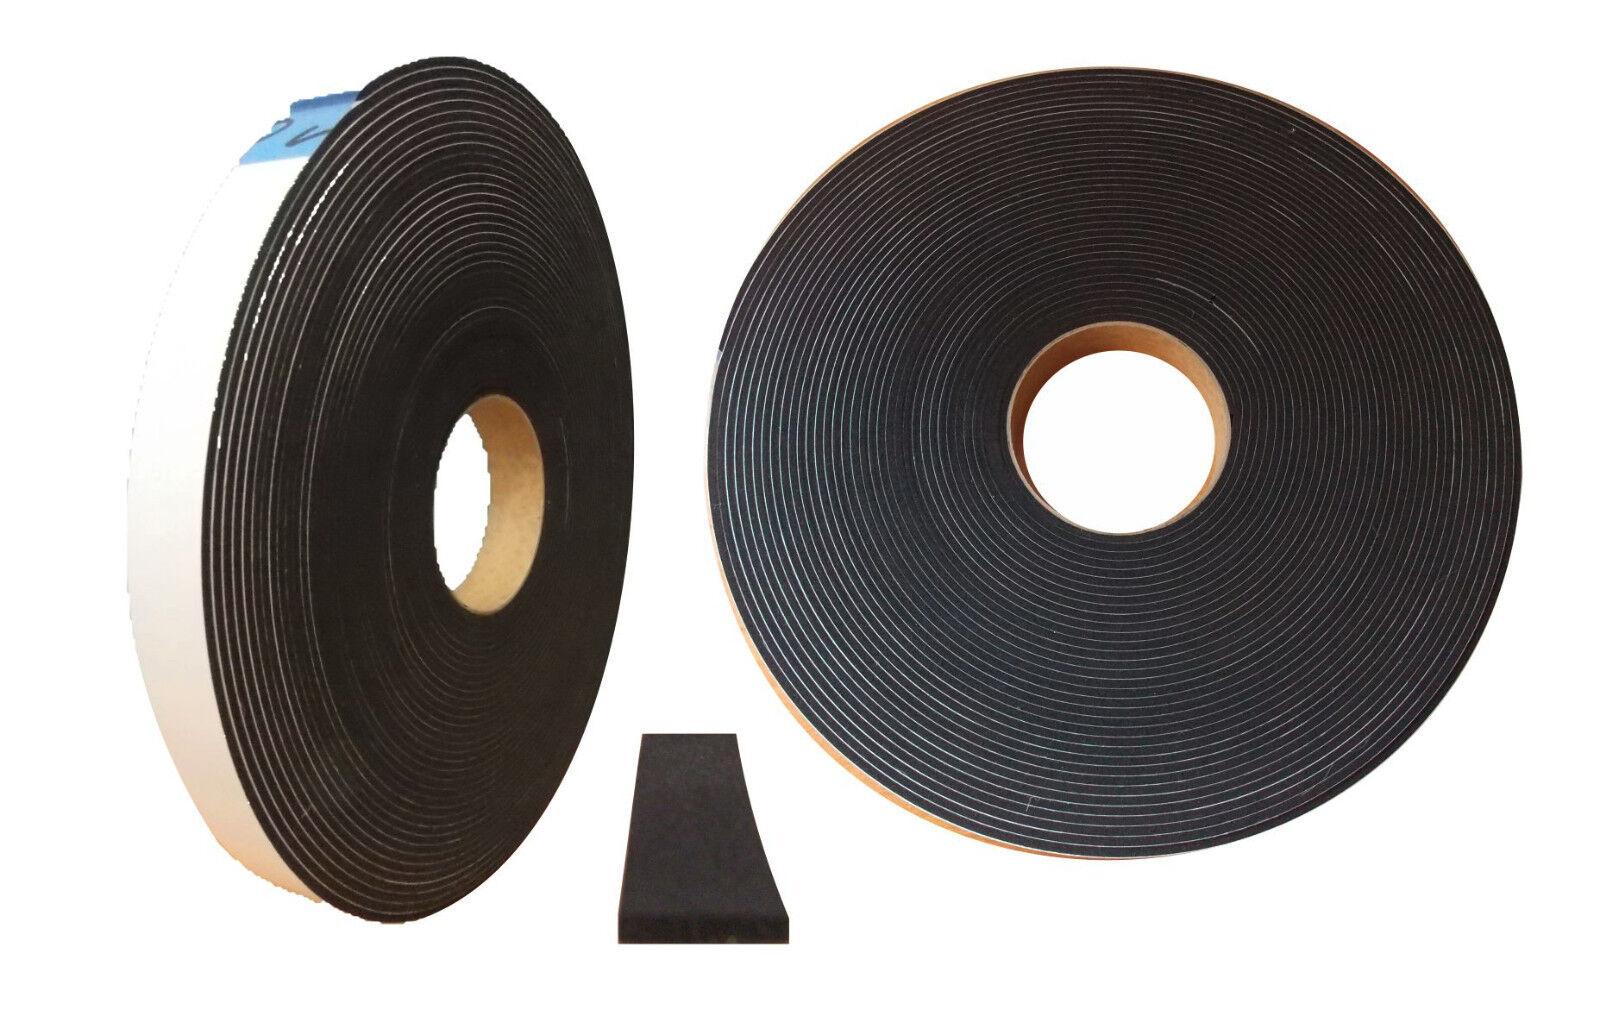 Moosgummi EPDM Flex Zellkautschuk Band selbstklebend UV-Besteändig •diverse Maße•